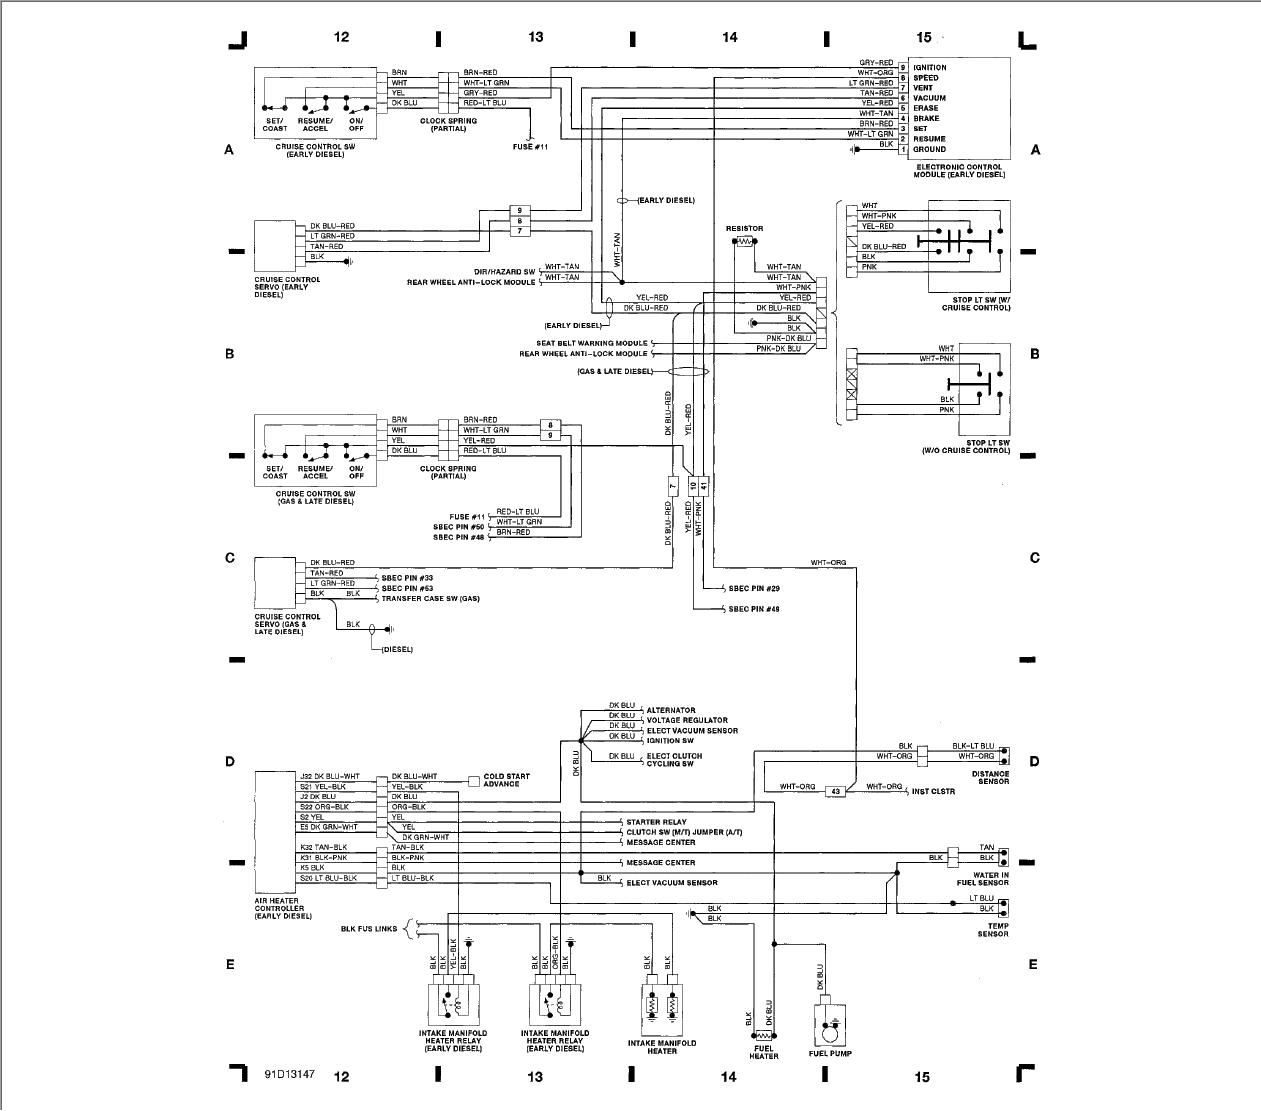 WC_8671] 1991 Dodge Pickup Wiring Diagram Sbec Schematic WiringAmenti Timew Barba Clesi Inifo Dome Mohammedshrine Librar Wiring 101